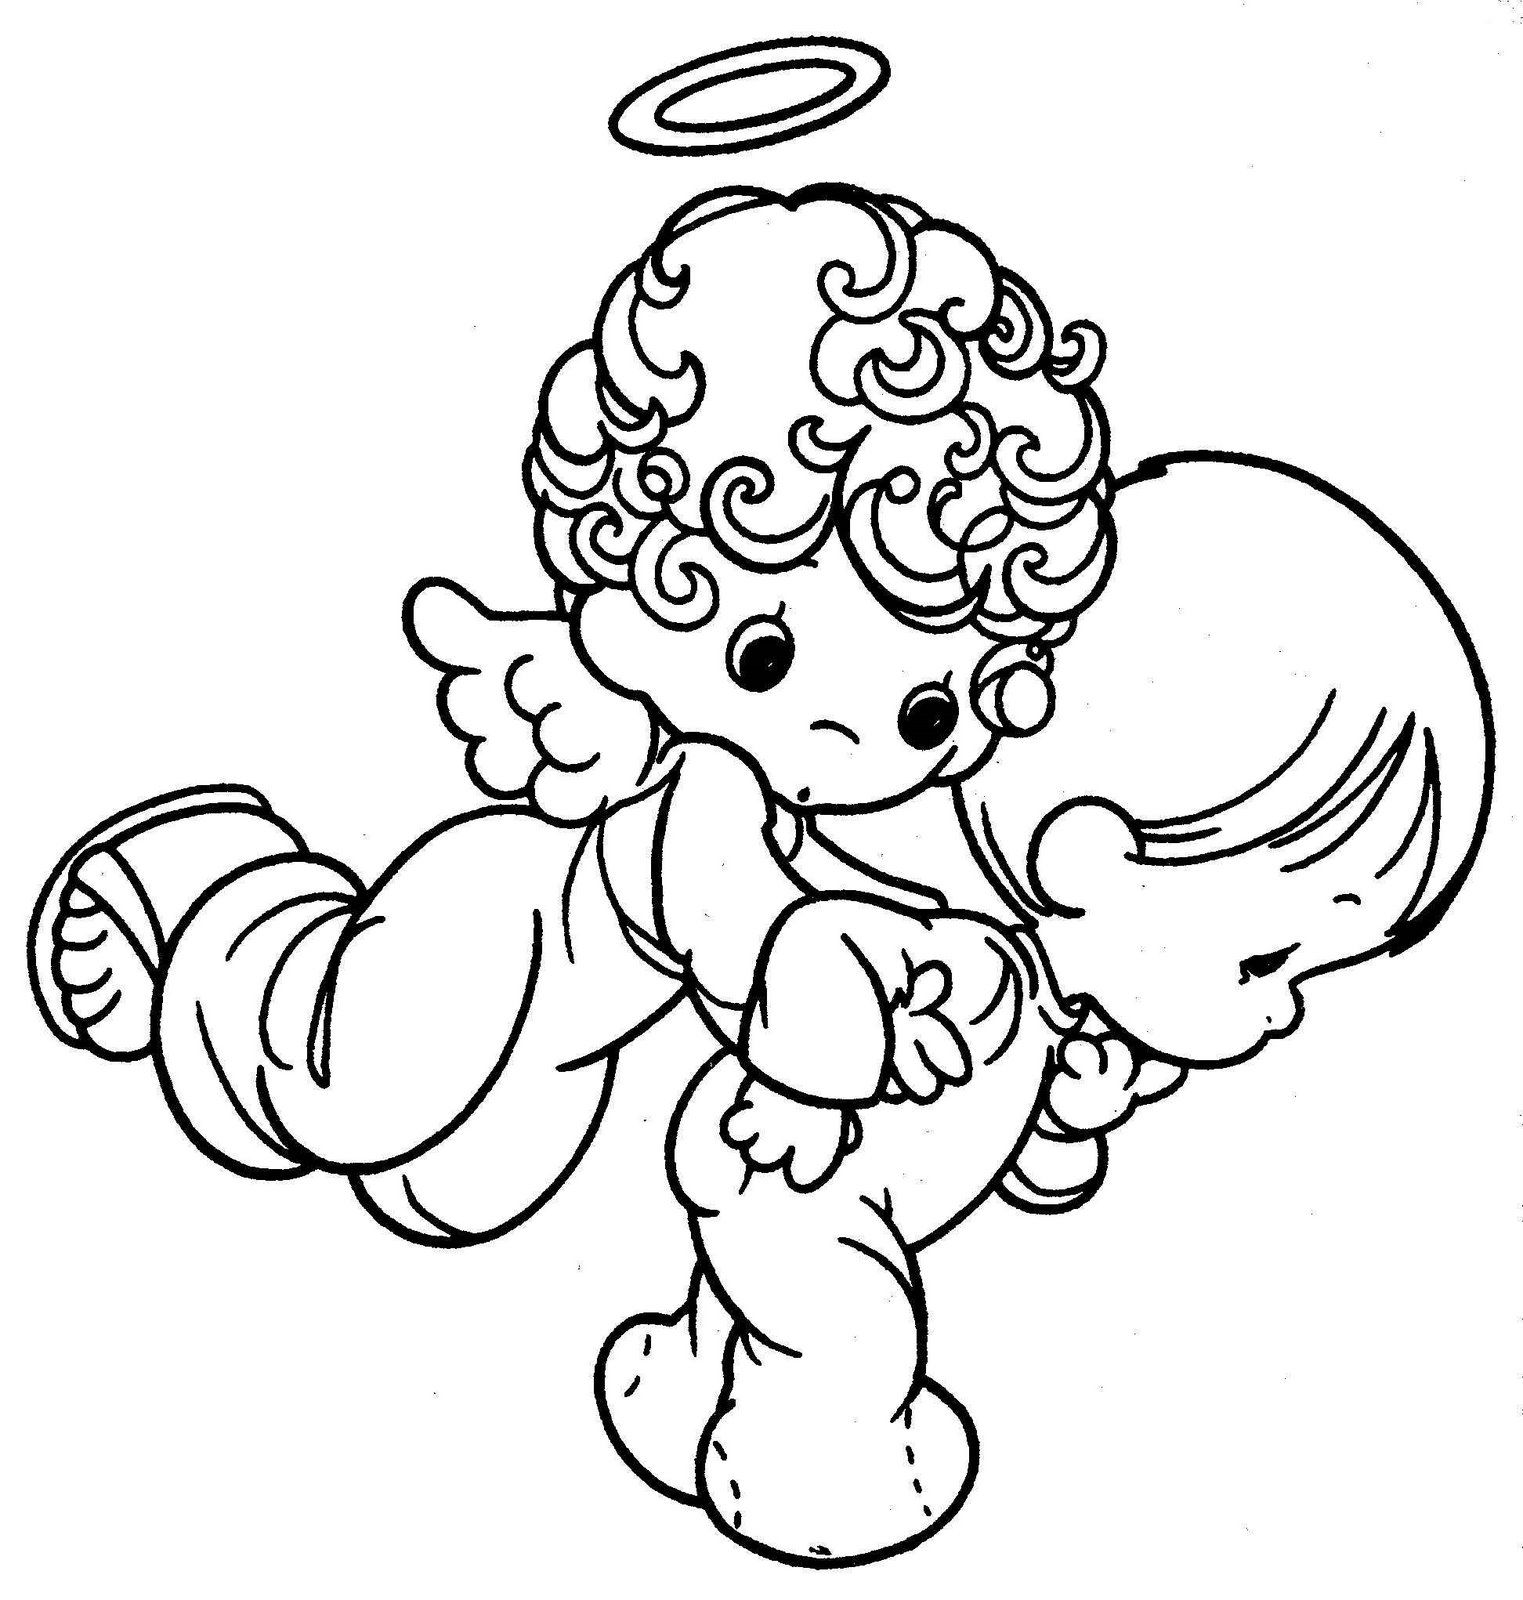 Infantiles Dibujos Para Colorear Dibujos Para Decorar